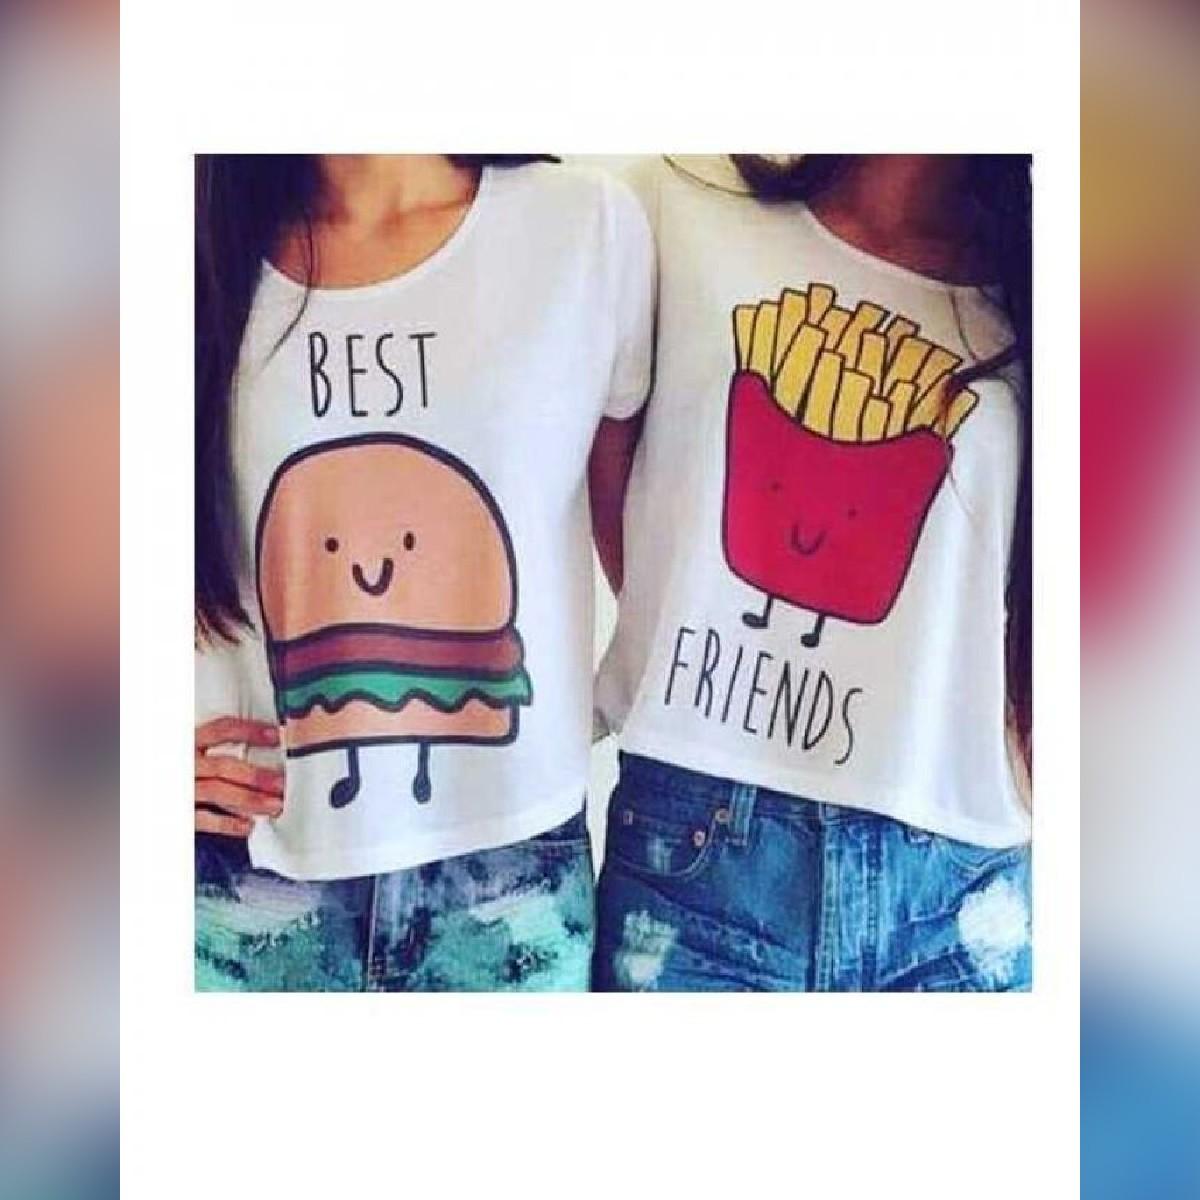 Pack of 2 BEST FRIENDS Printed tshirts